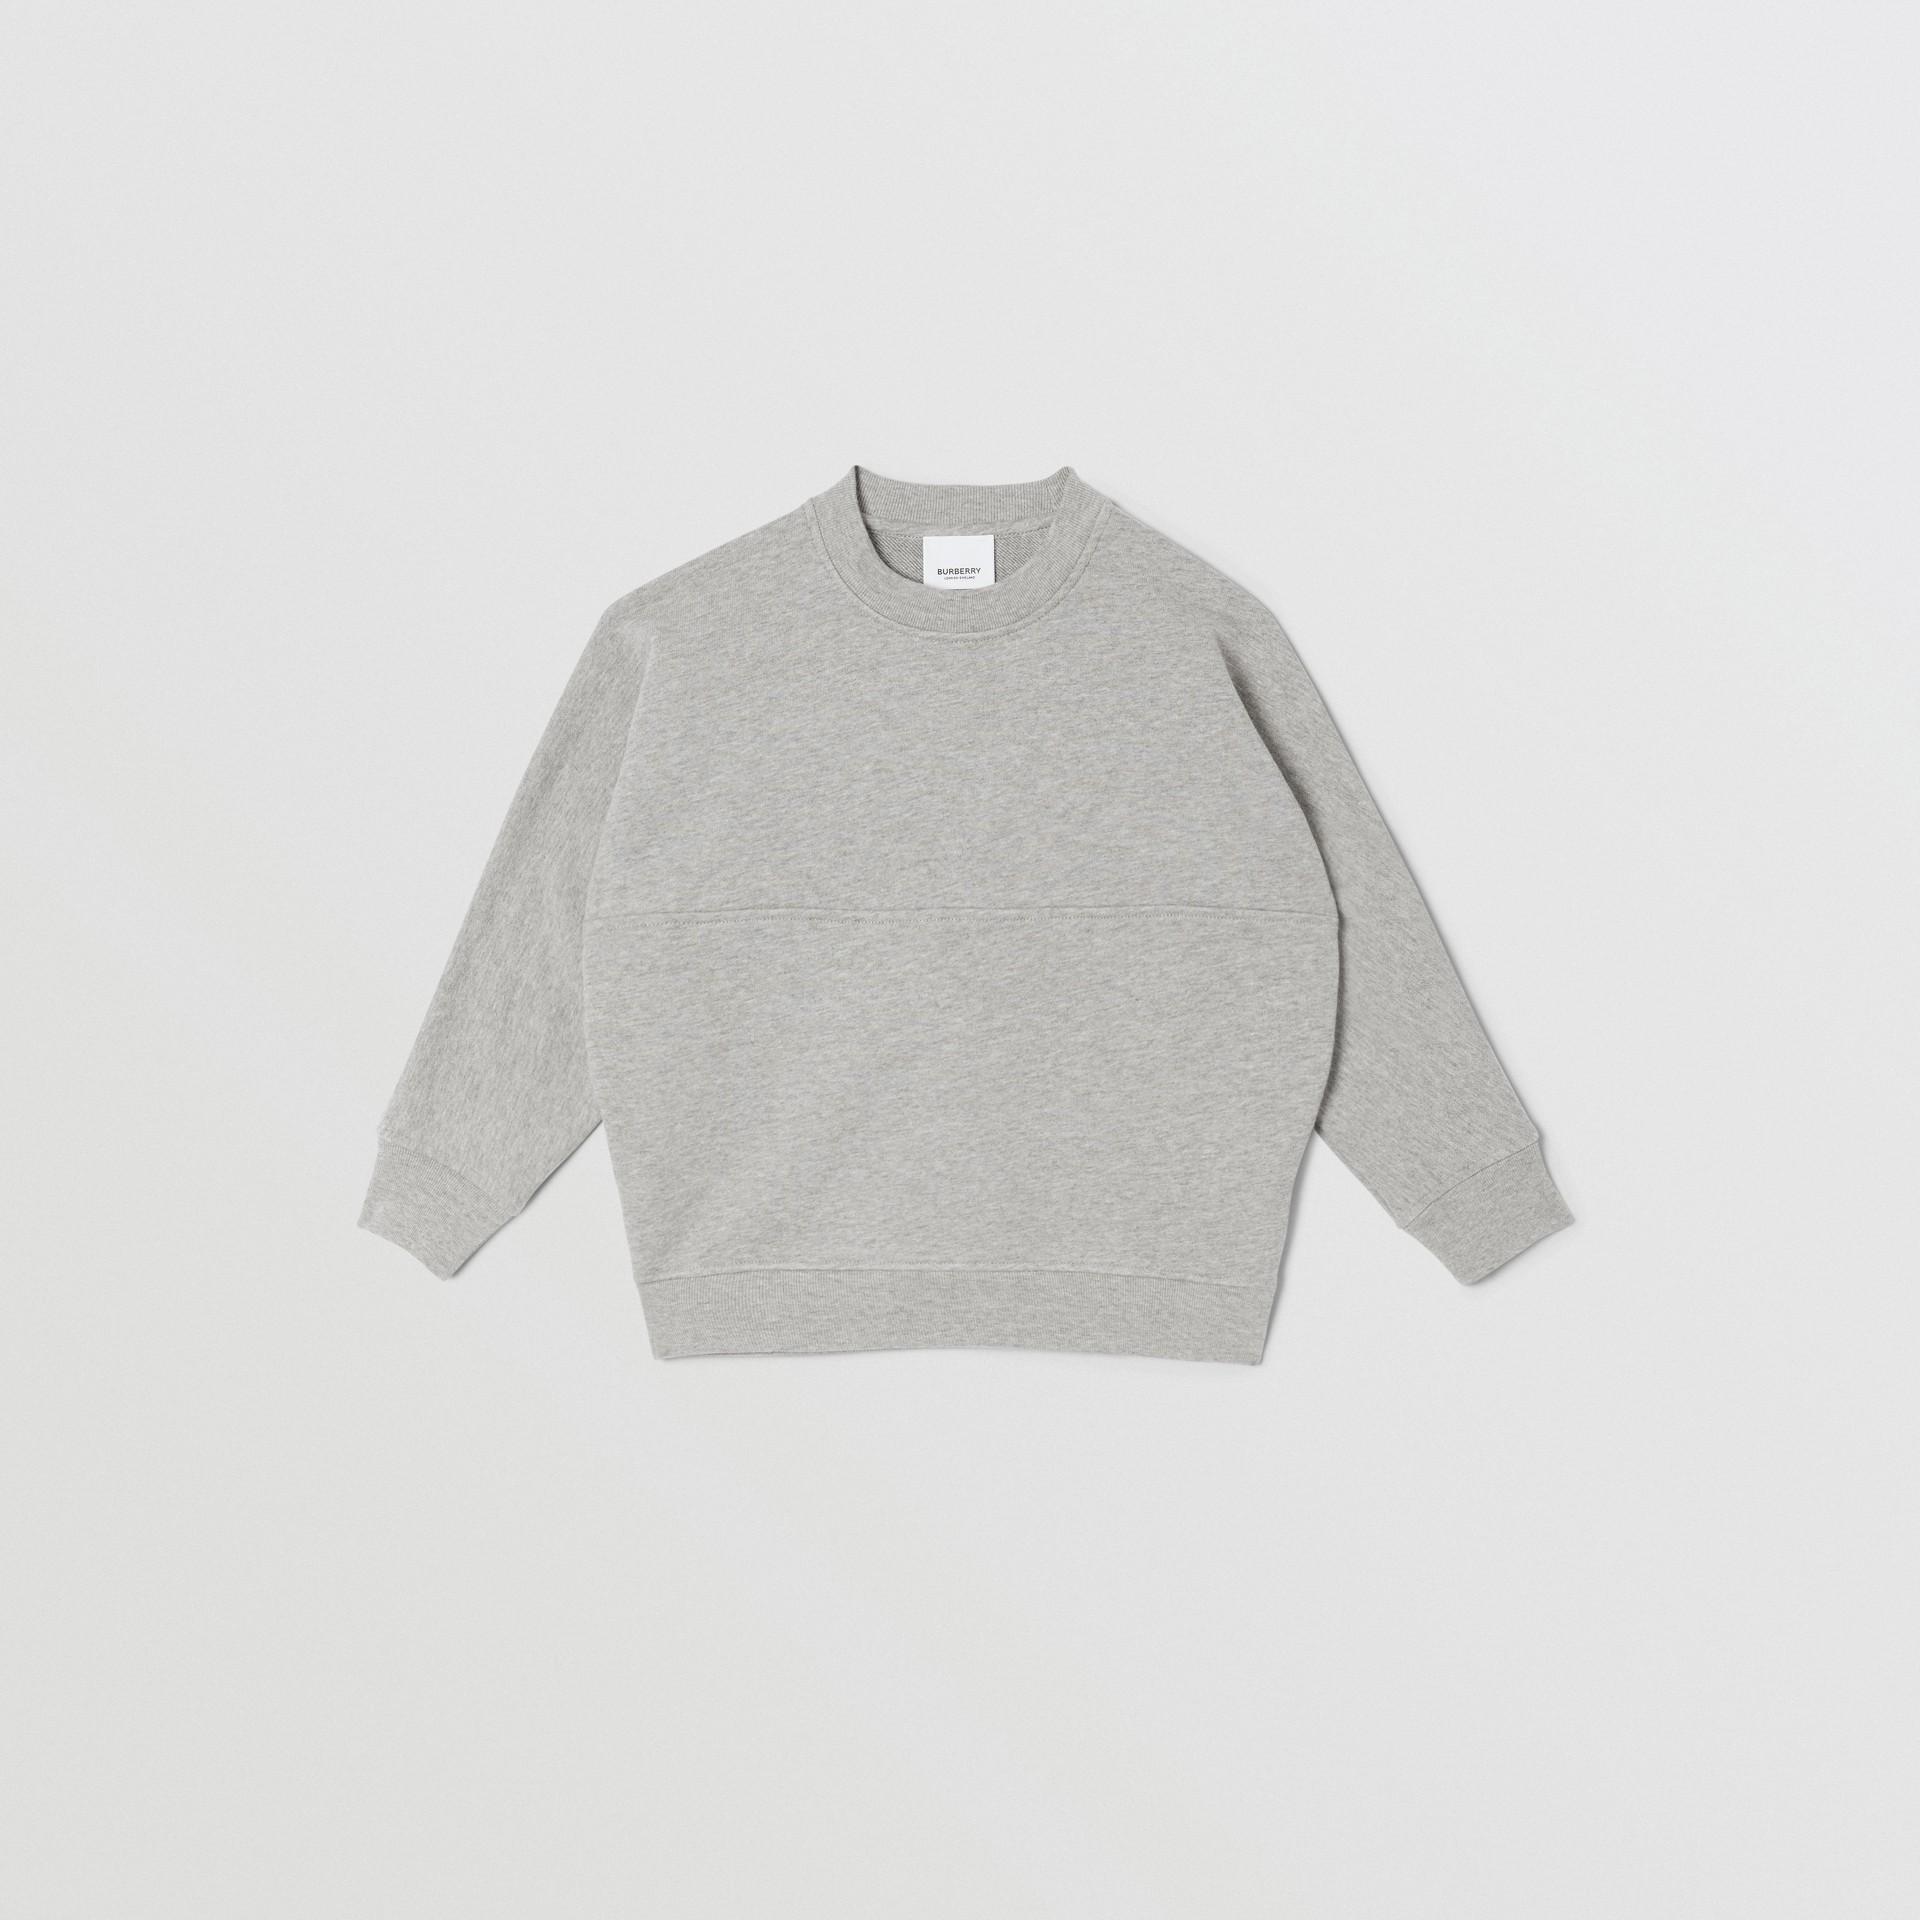 Logo Print Cotton Sweatshirt in Grey Melange/black   Burberry United States - gallery image 0